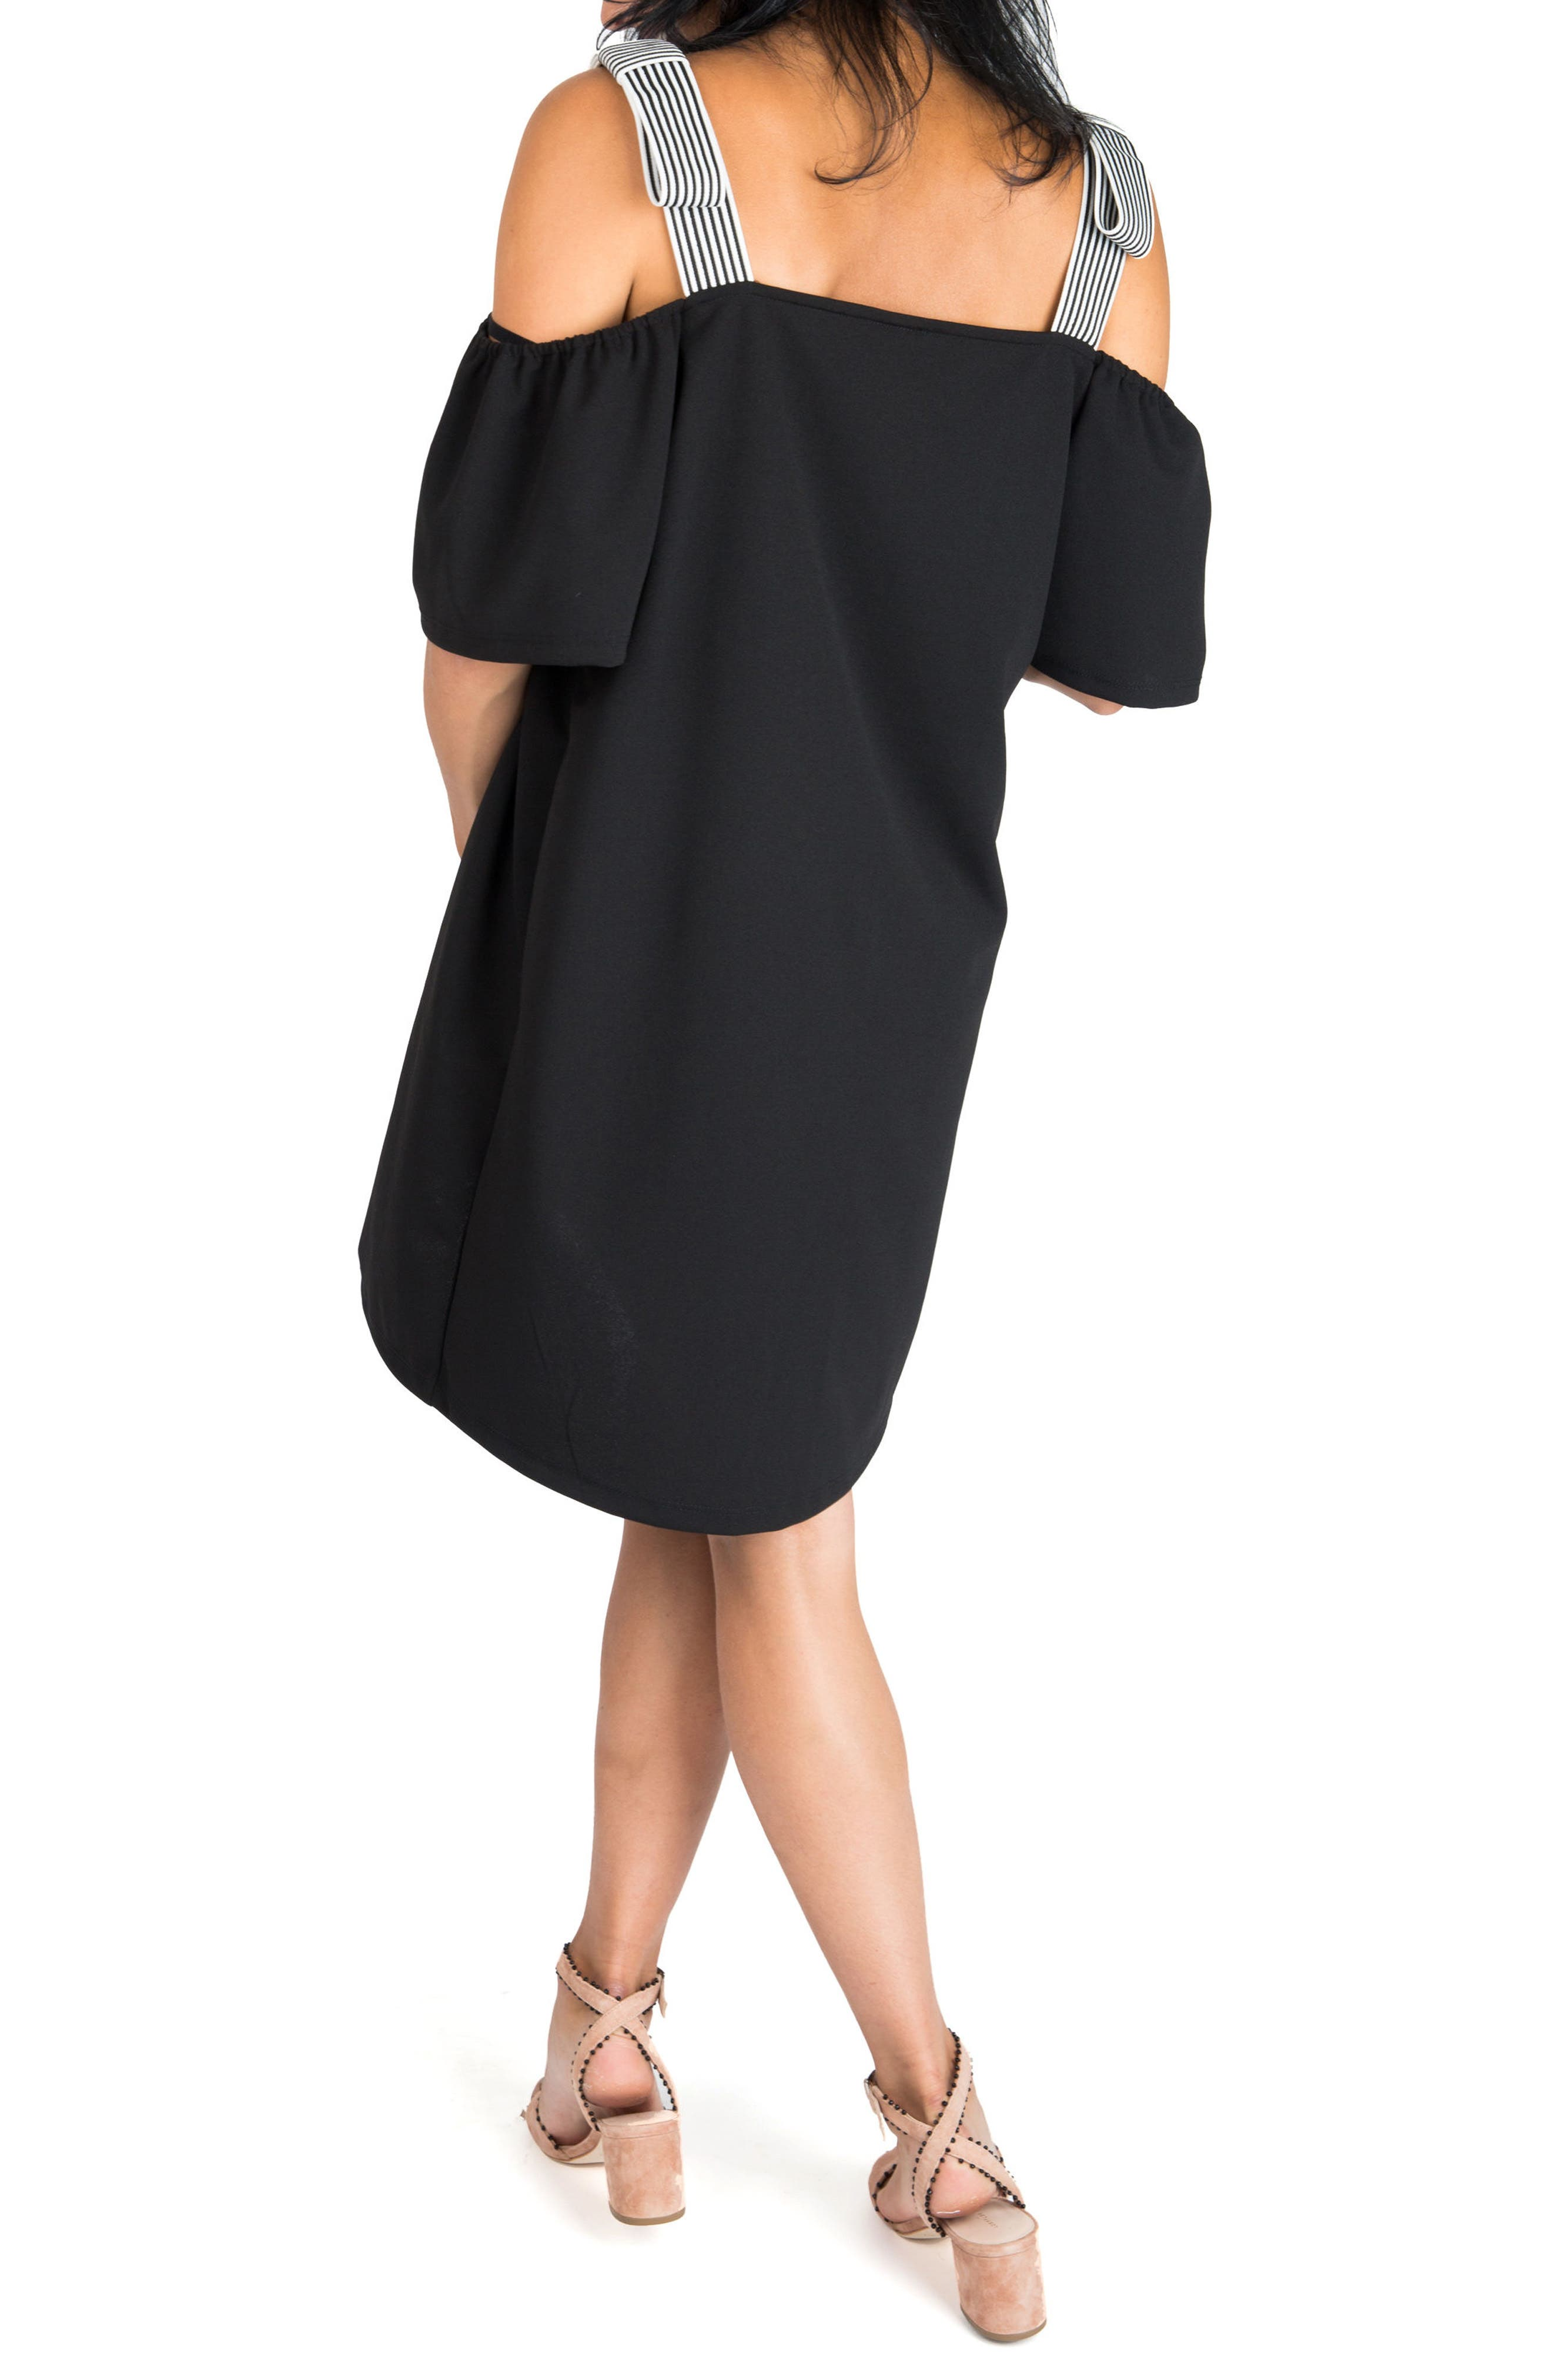 NOM MATERNITY,                             Millie Off the Shoulder Maternity Dress,                             Alternate thumbnail 2, color,                             BLACK